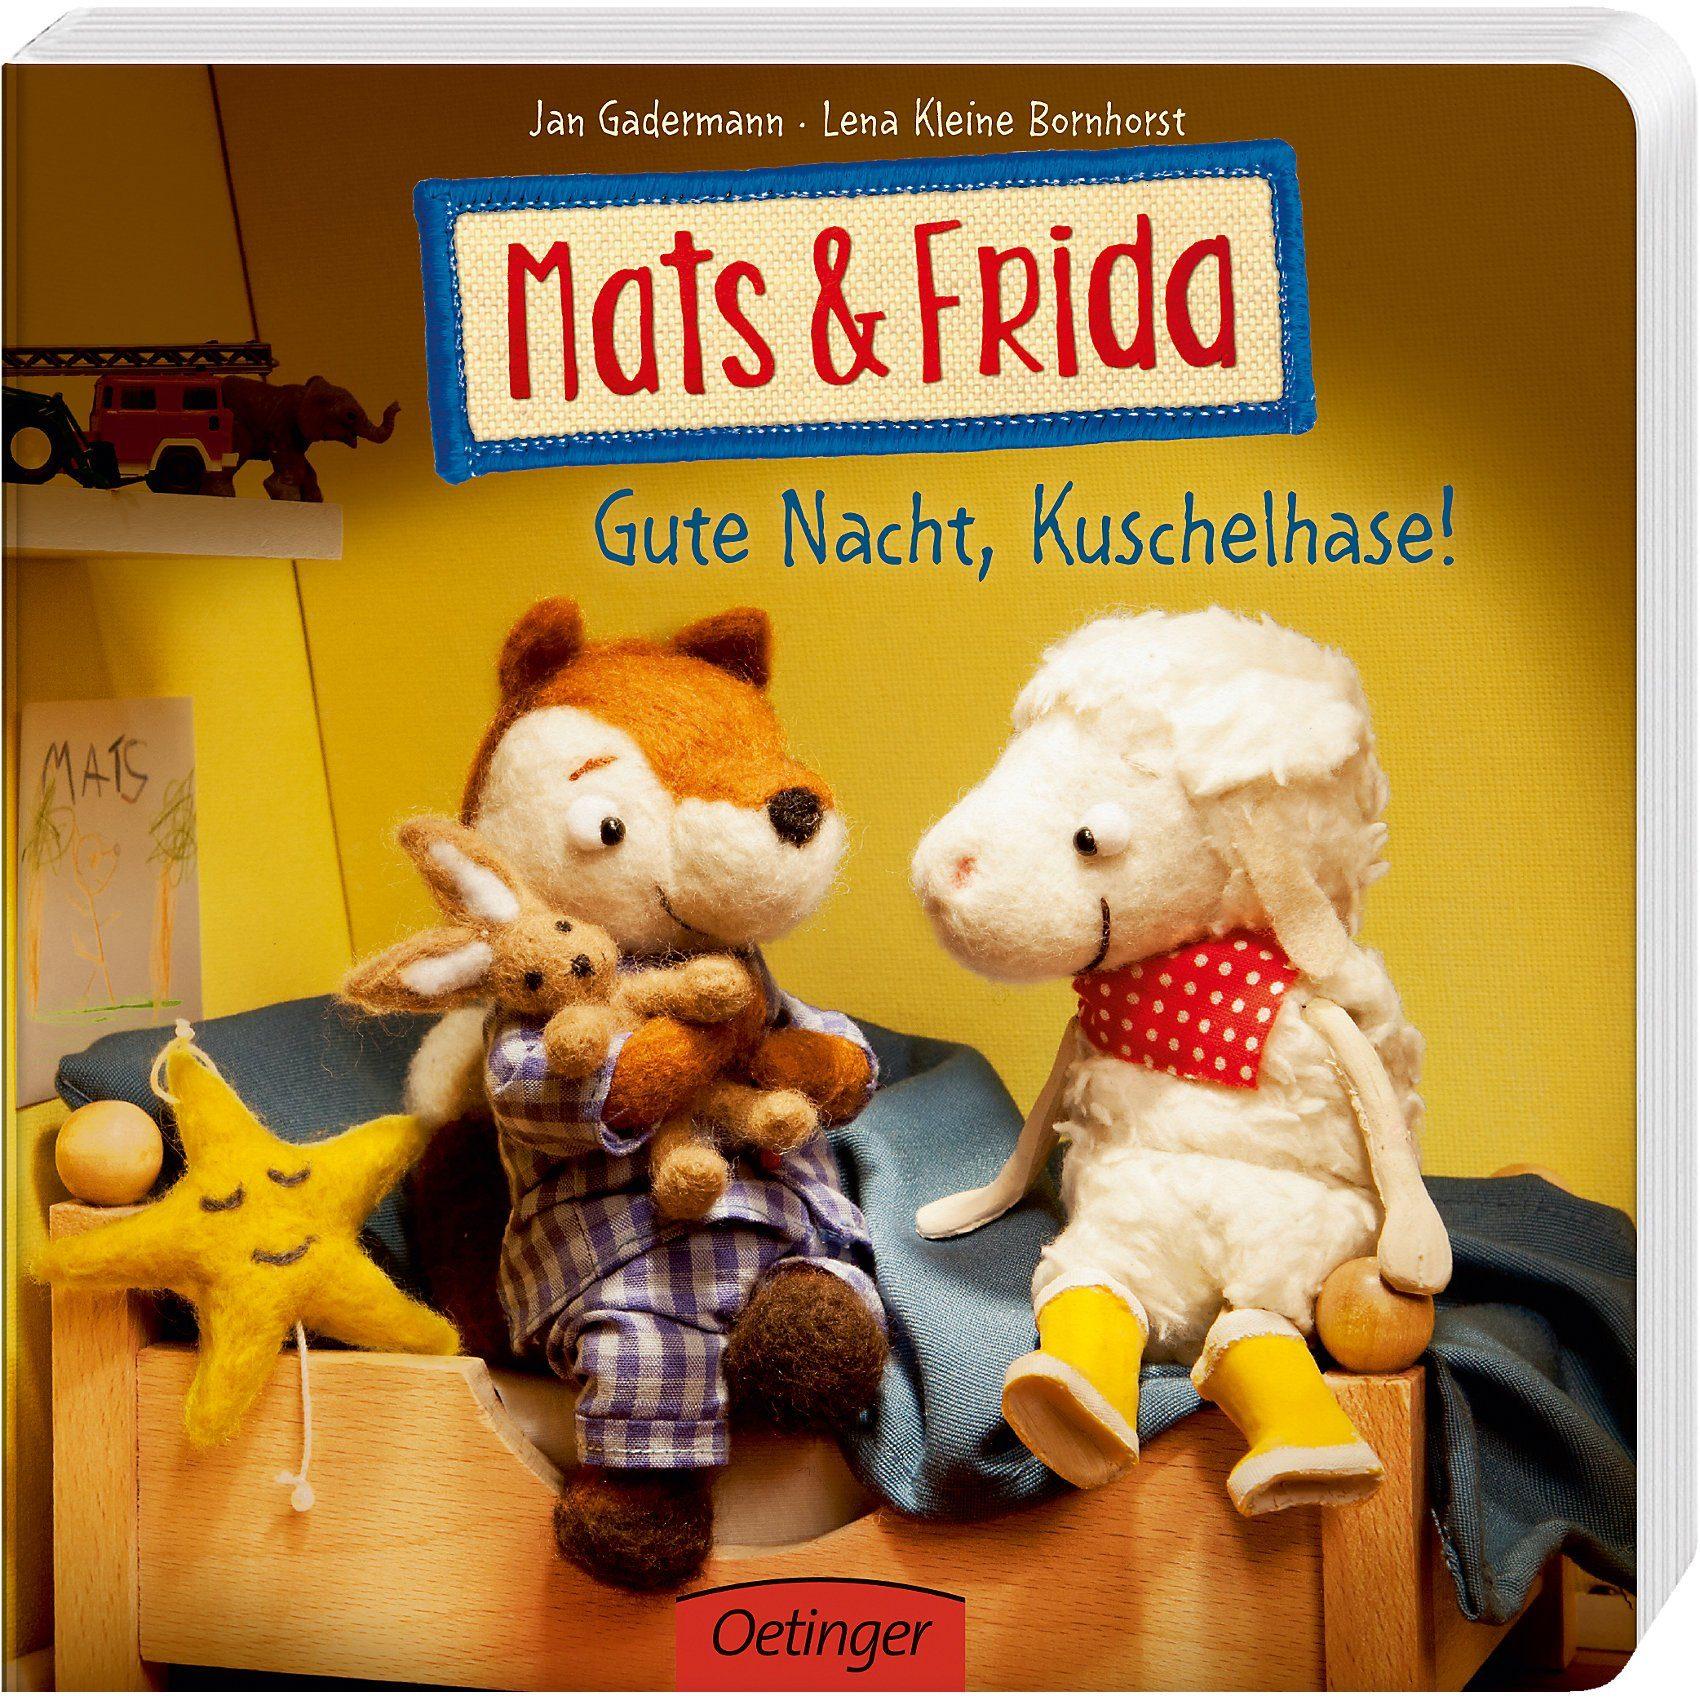 Oetinger Mats & Frida: Gute Nacht, Kuschelhase!